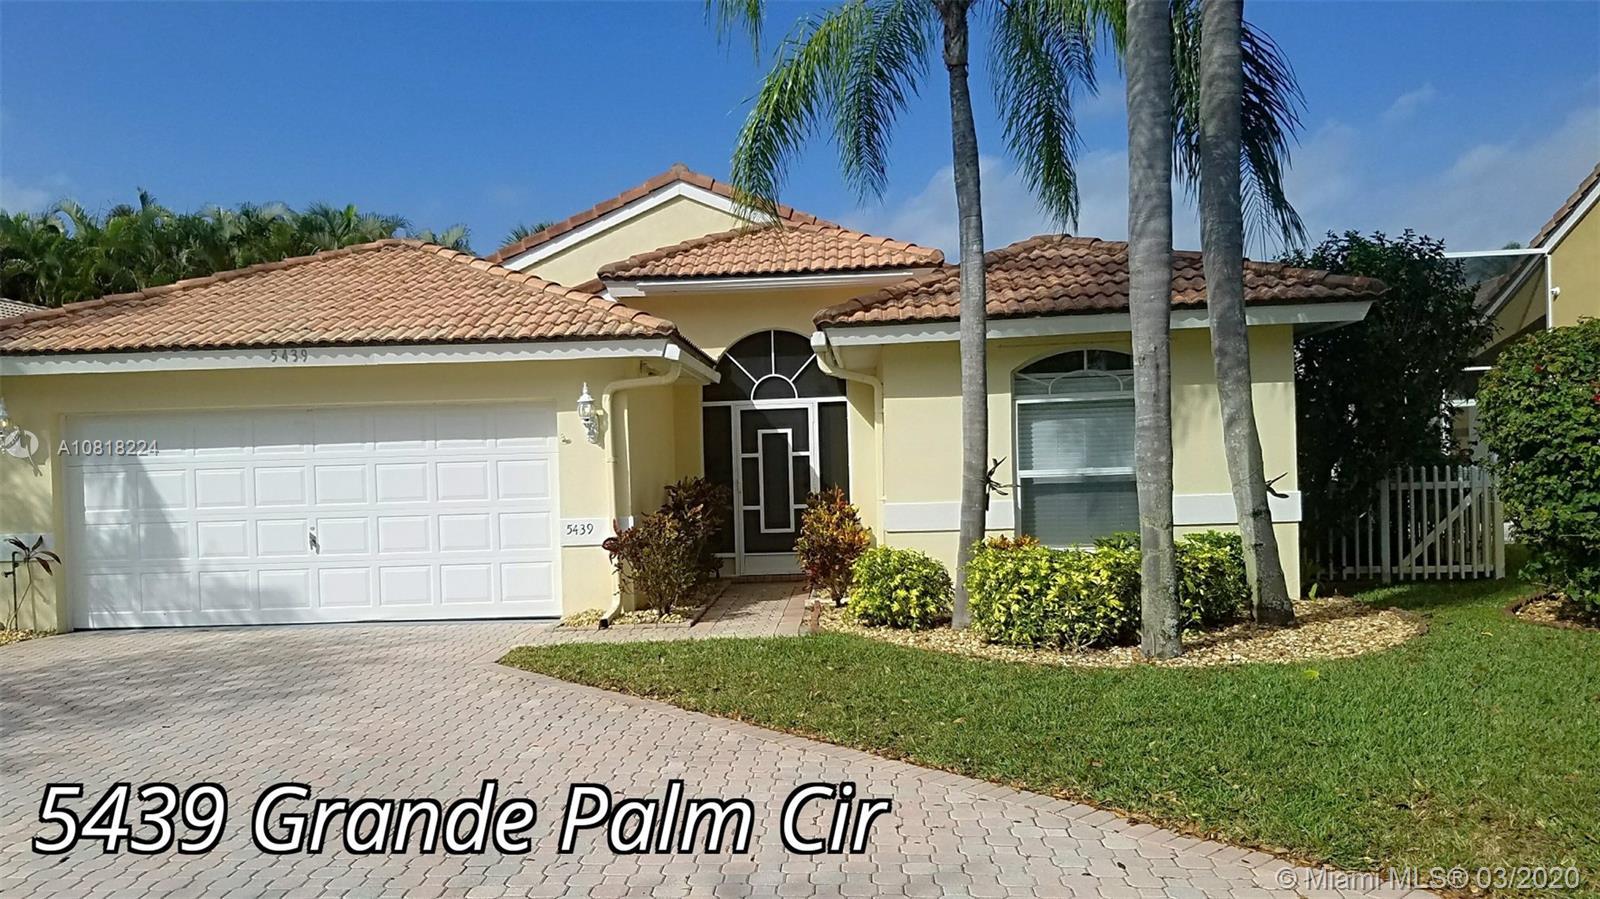 5439 Grande Palm Cir, Delray Beach, FL 33484